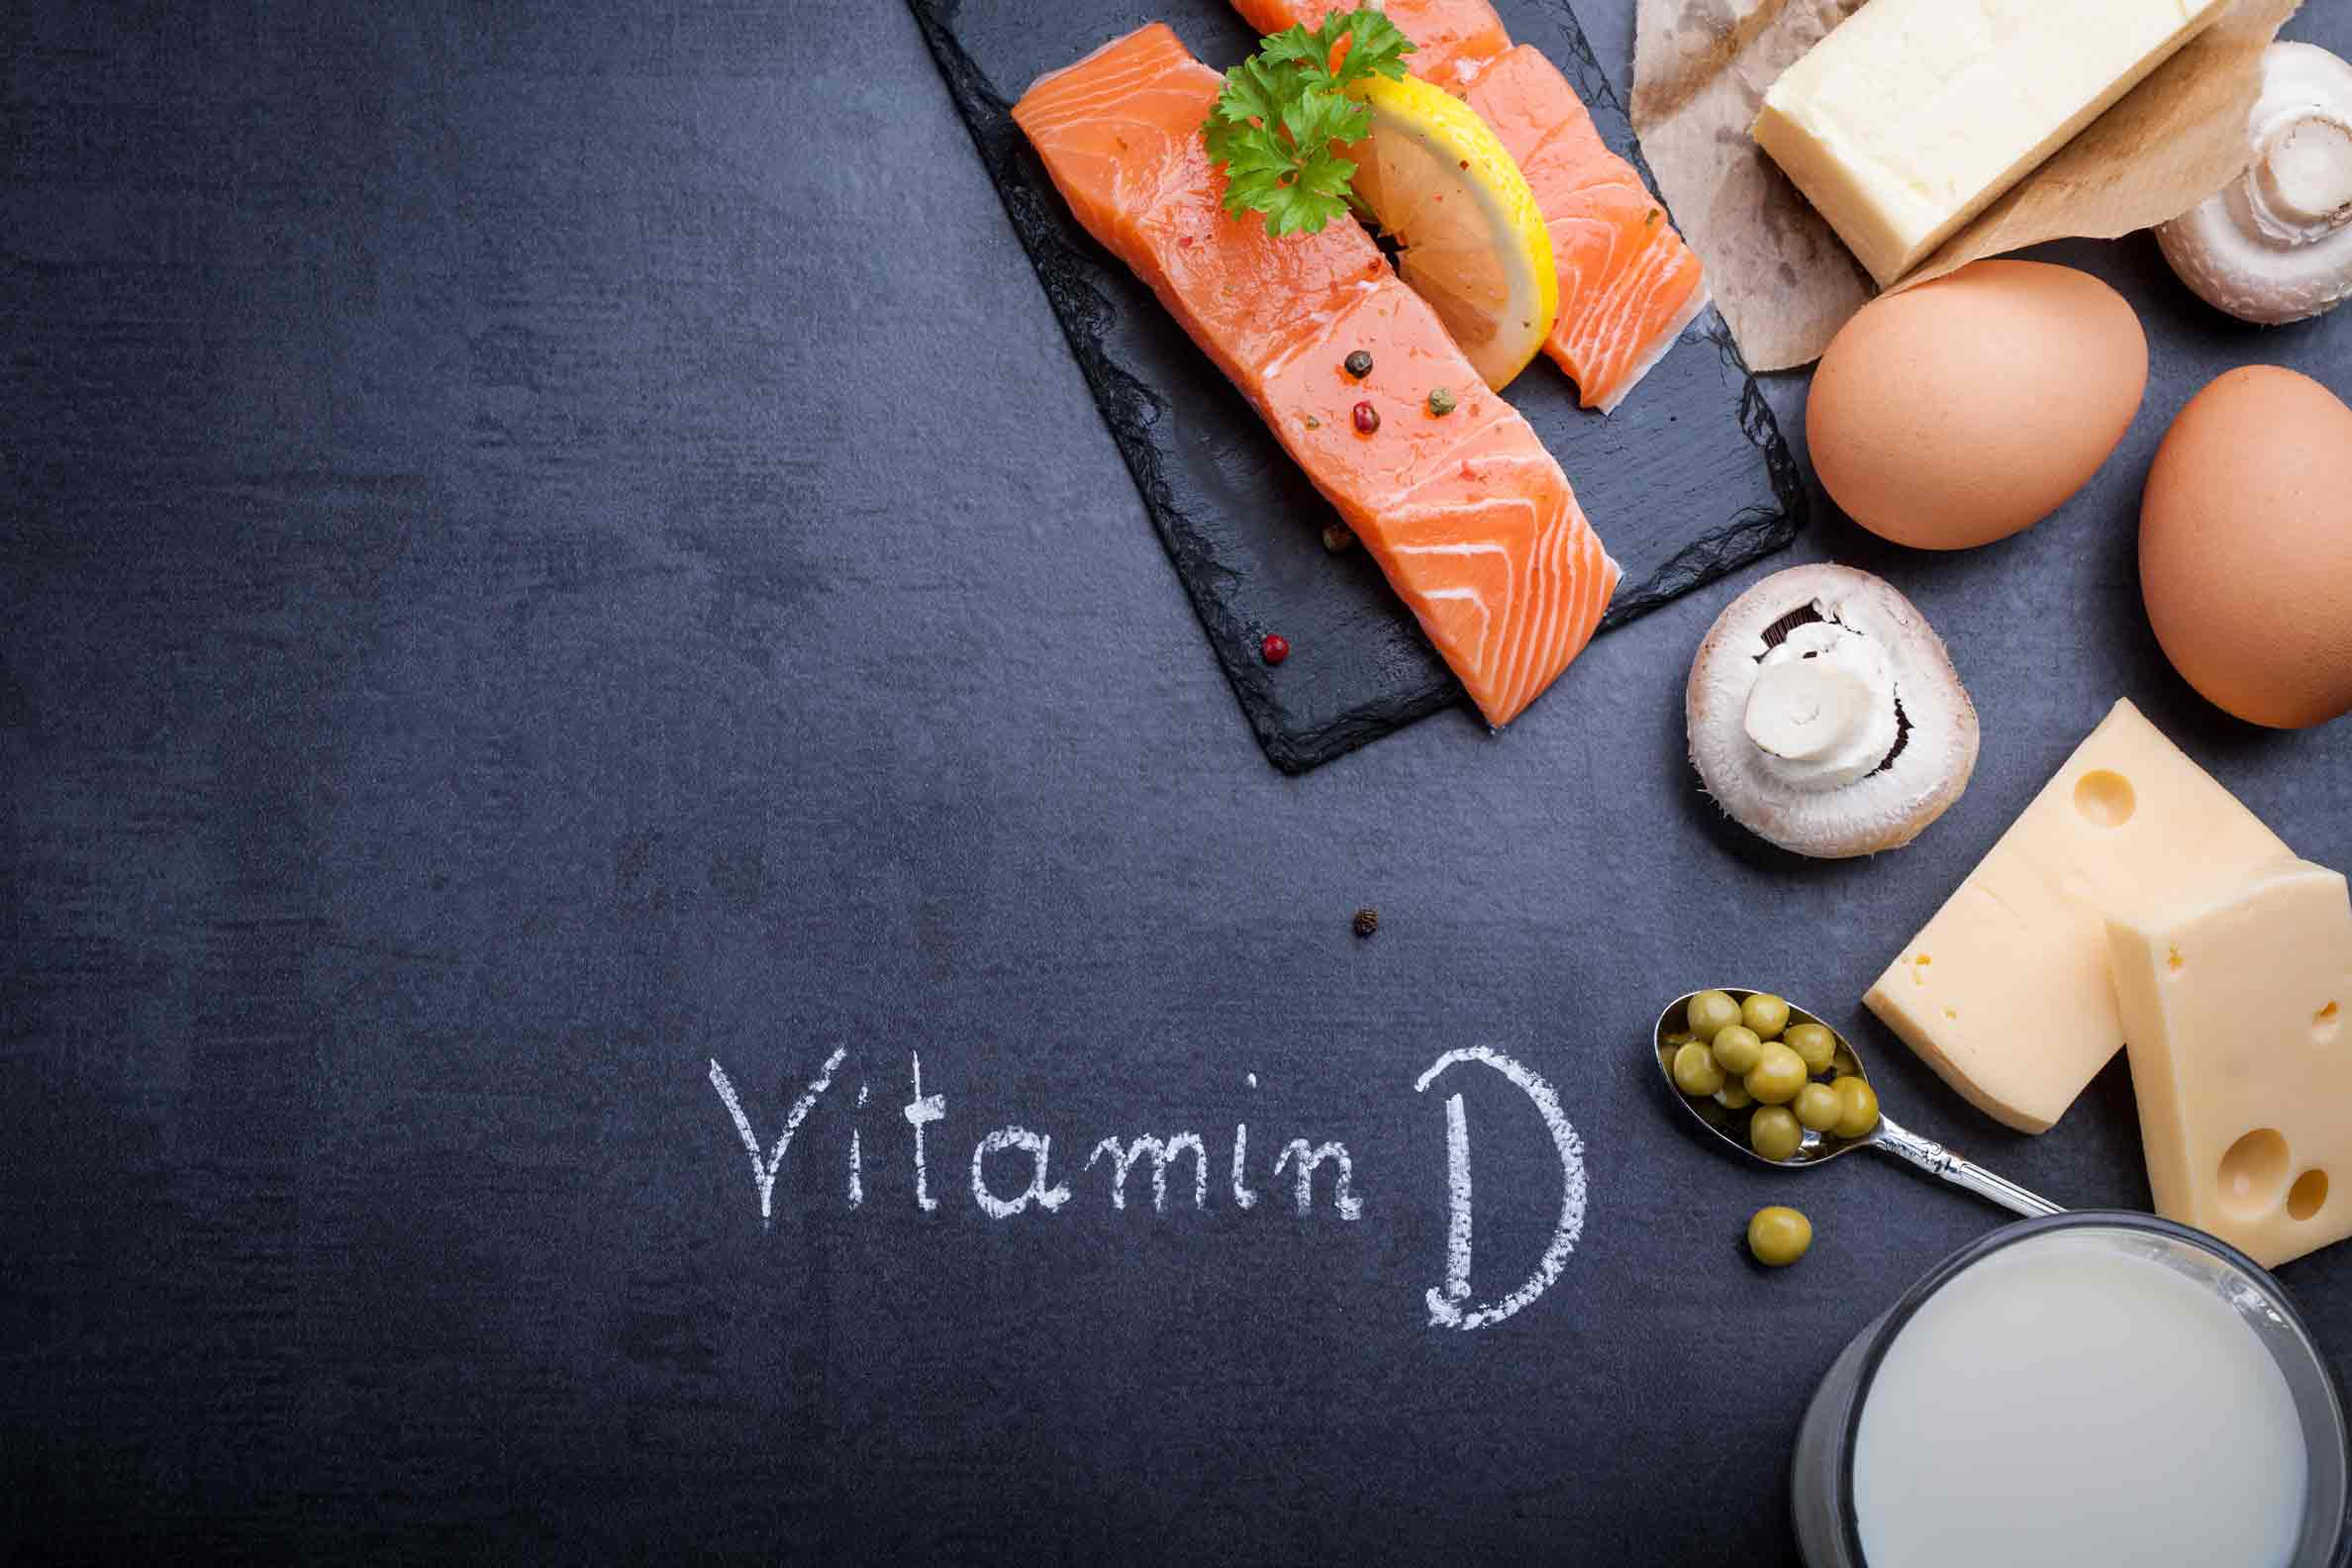 Frutas com Vitamina D? Veja aqui.